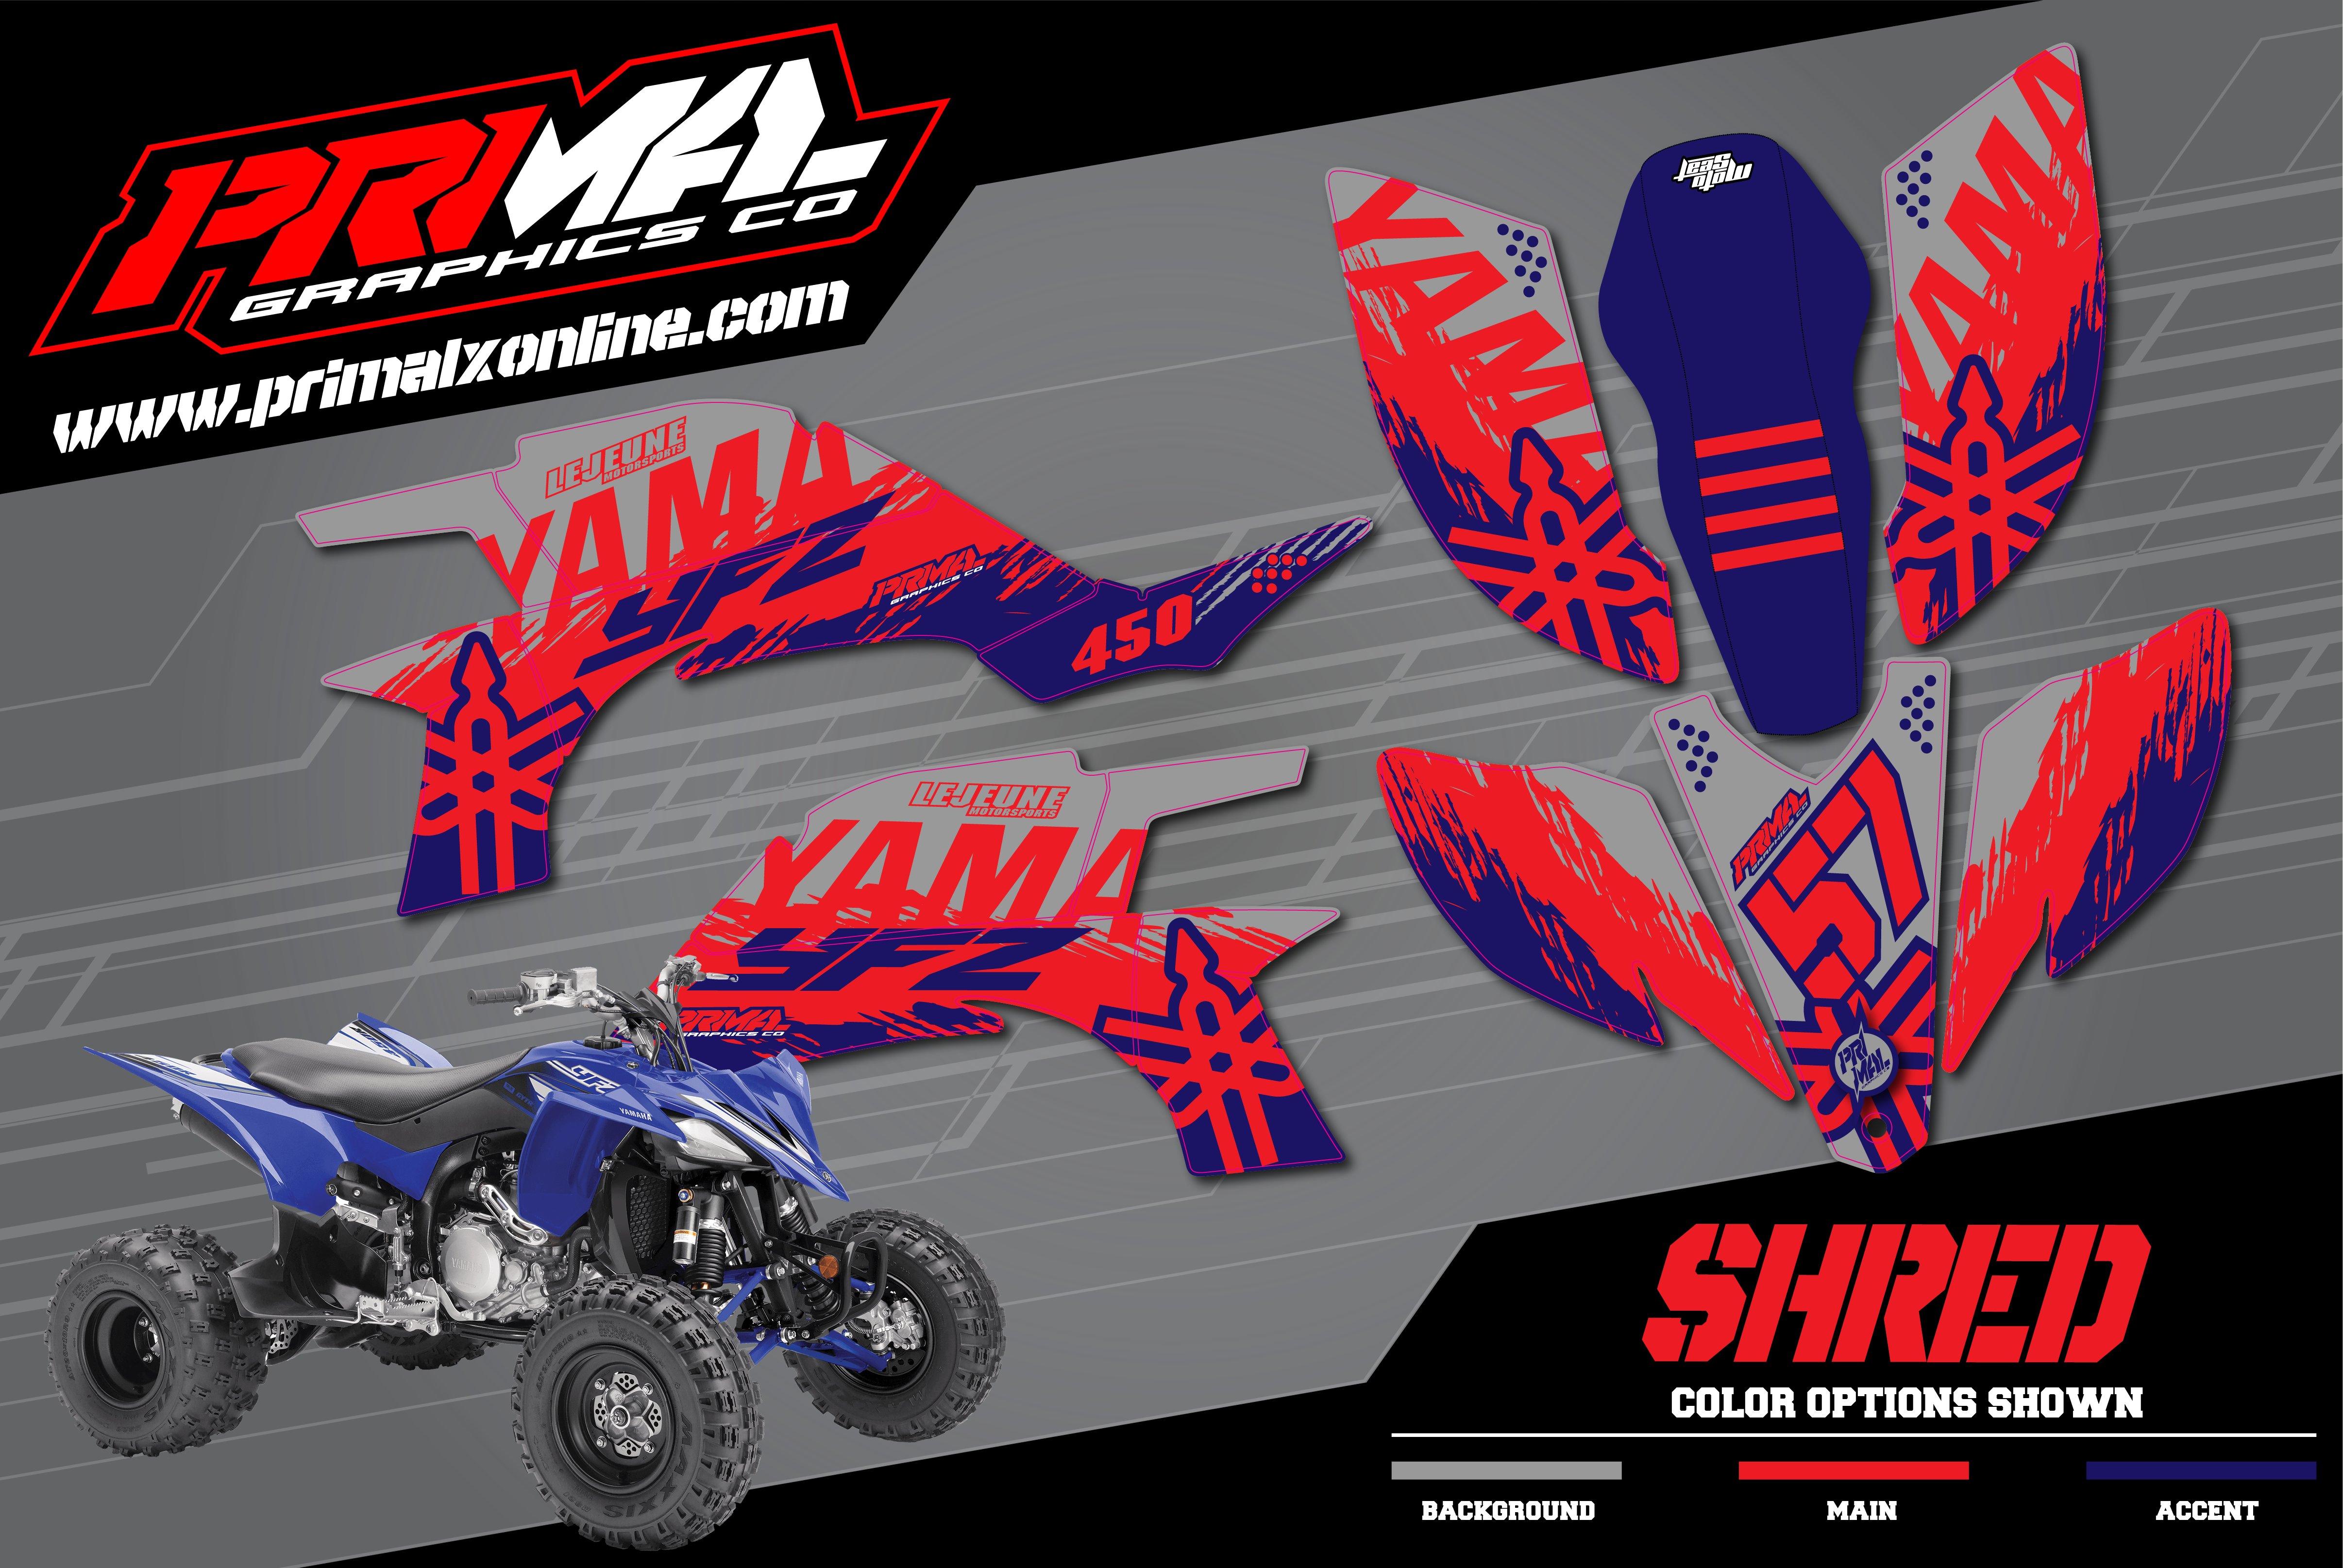 1_PRIMAL-X-MOTORSPORTS-PRIMAL-GRAPHICS-CO-YAMAHA-YFZ450-YFZ-ATV-GRAPHICS-MX-GRAPHICS-MX-DECALS-QUAD-GRAPHICS-01